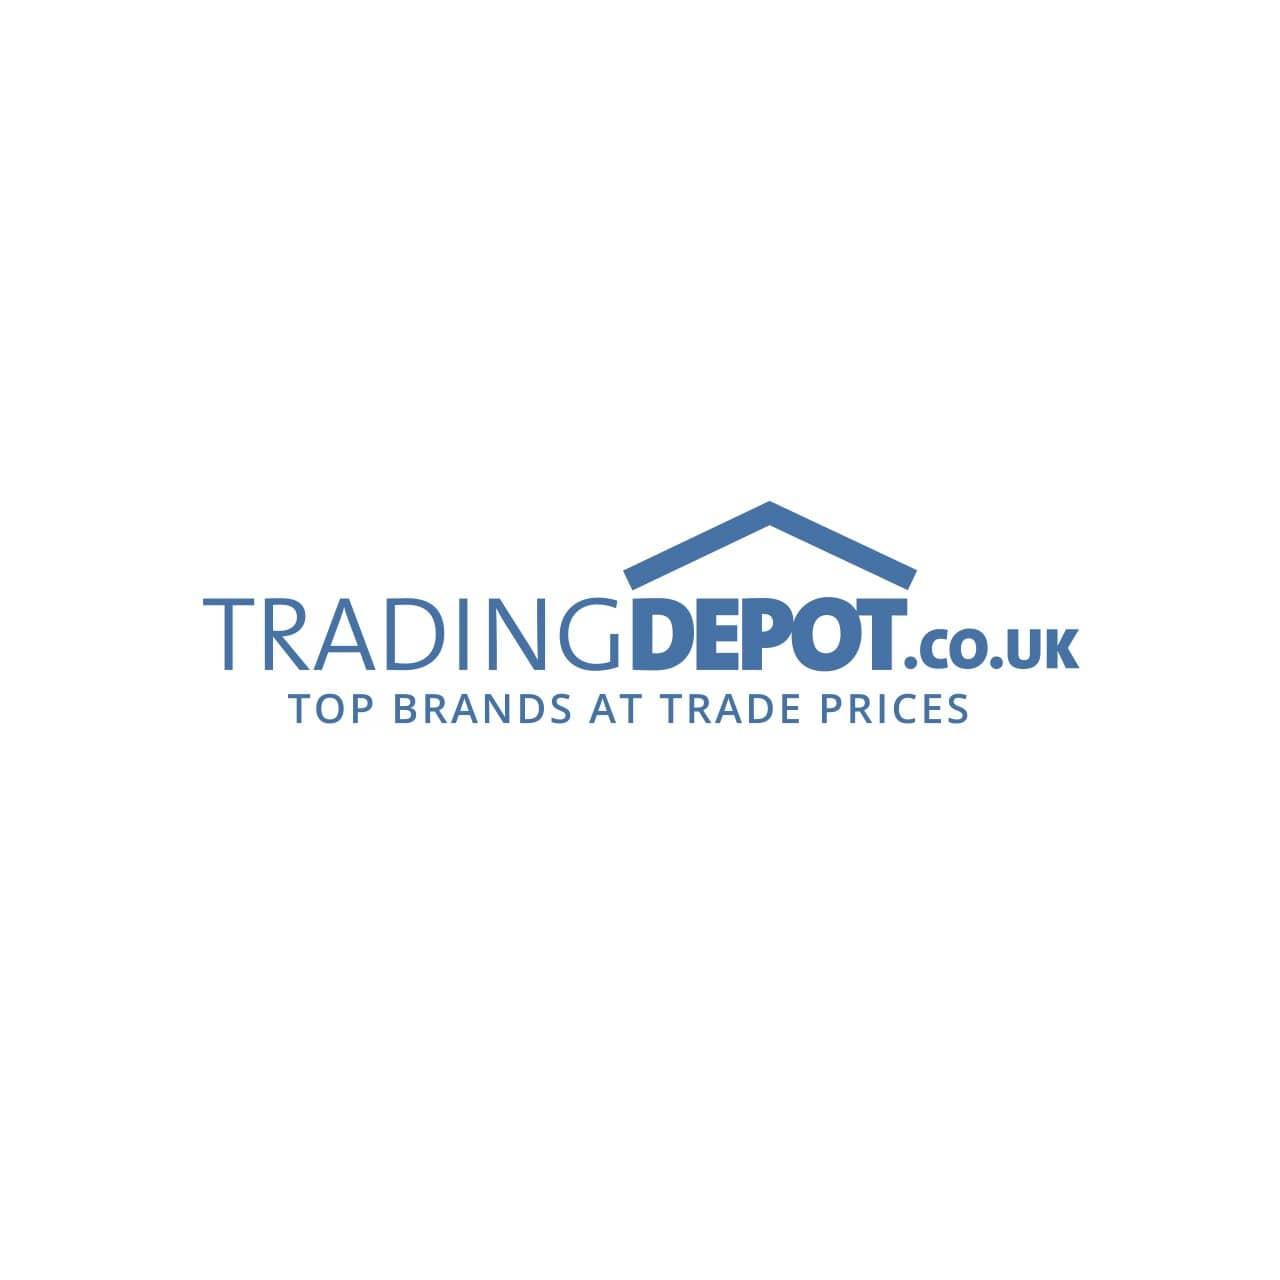 Tesi su trading system